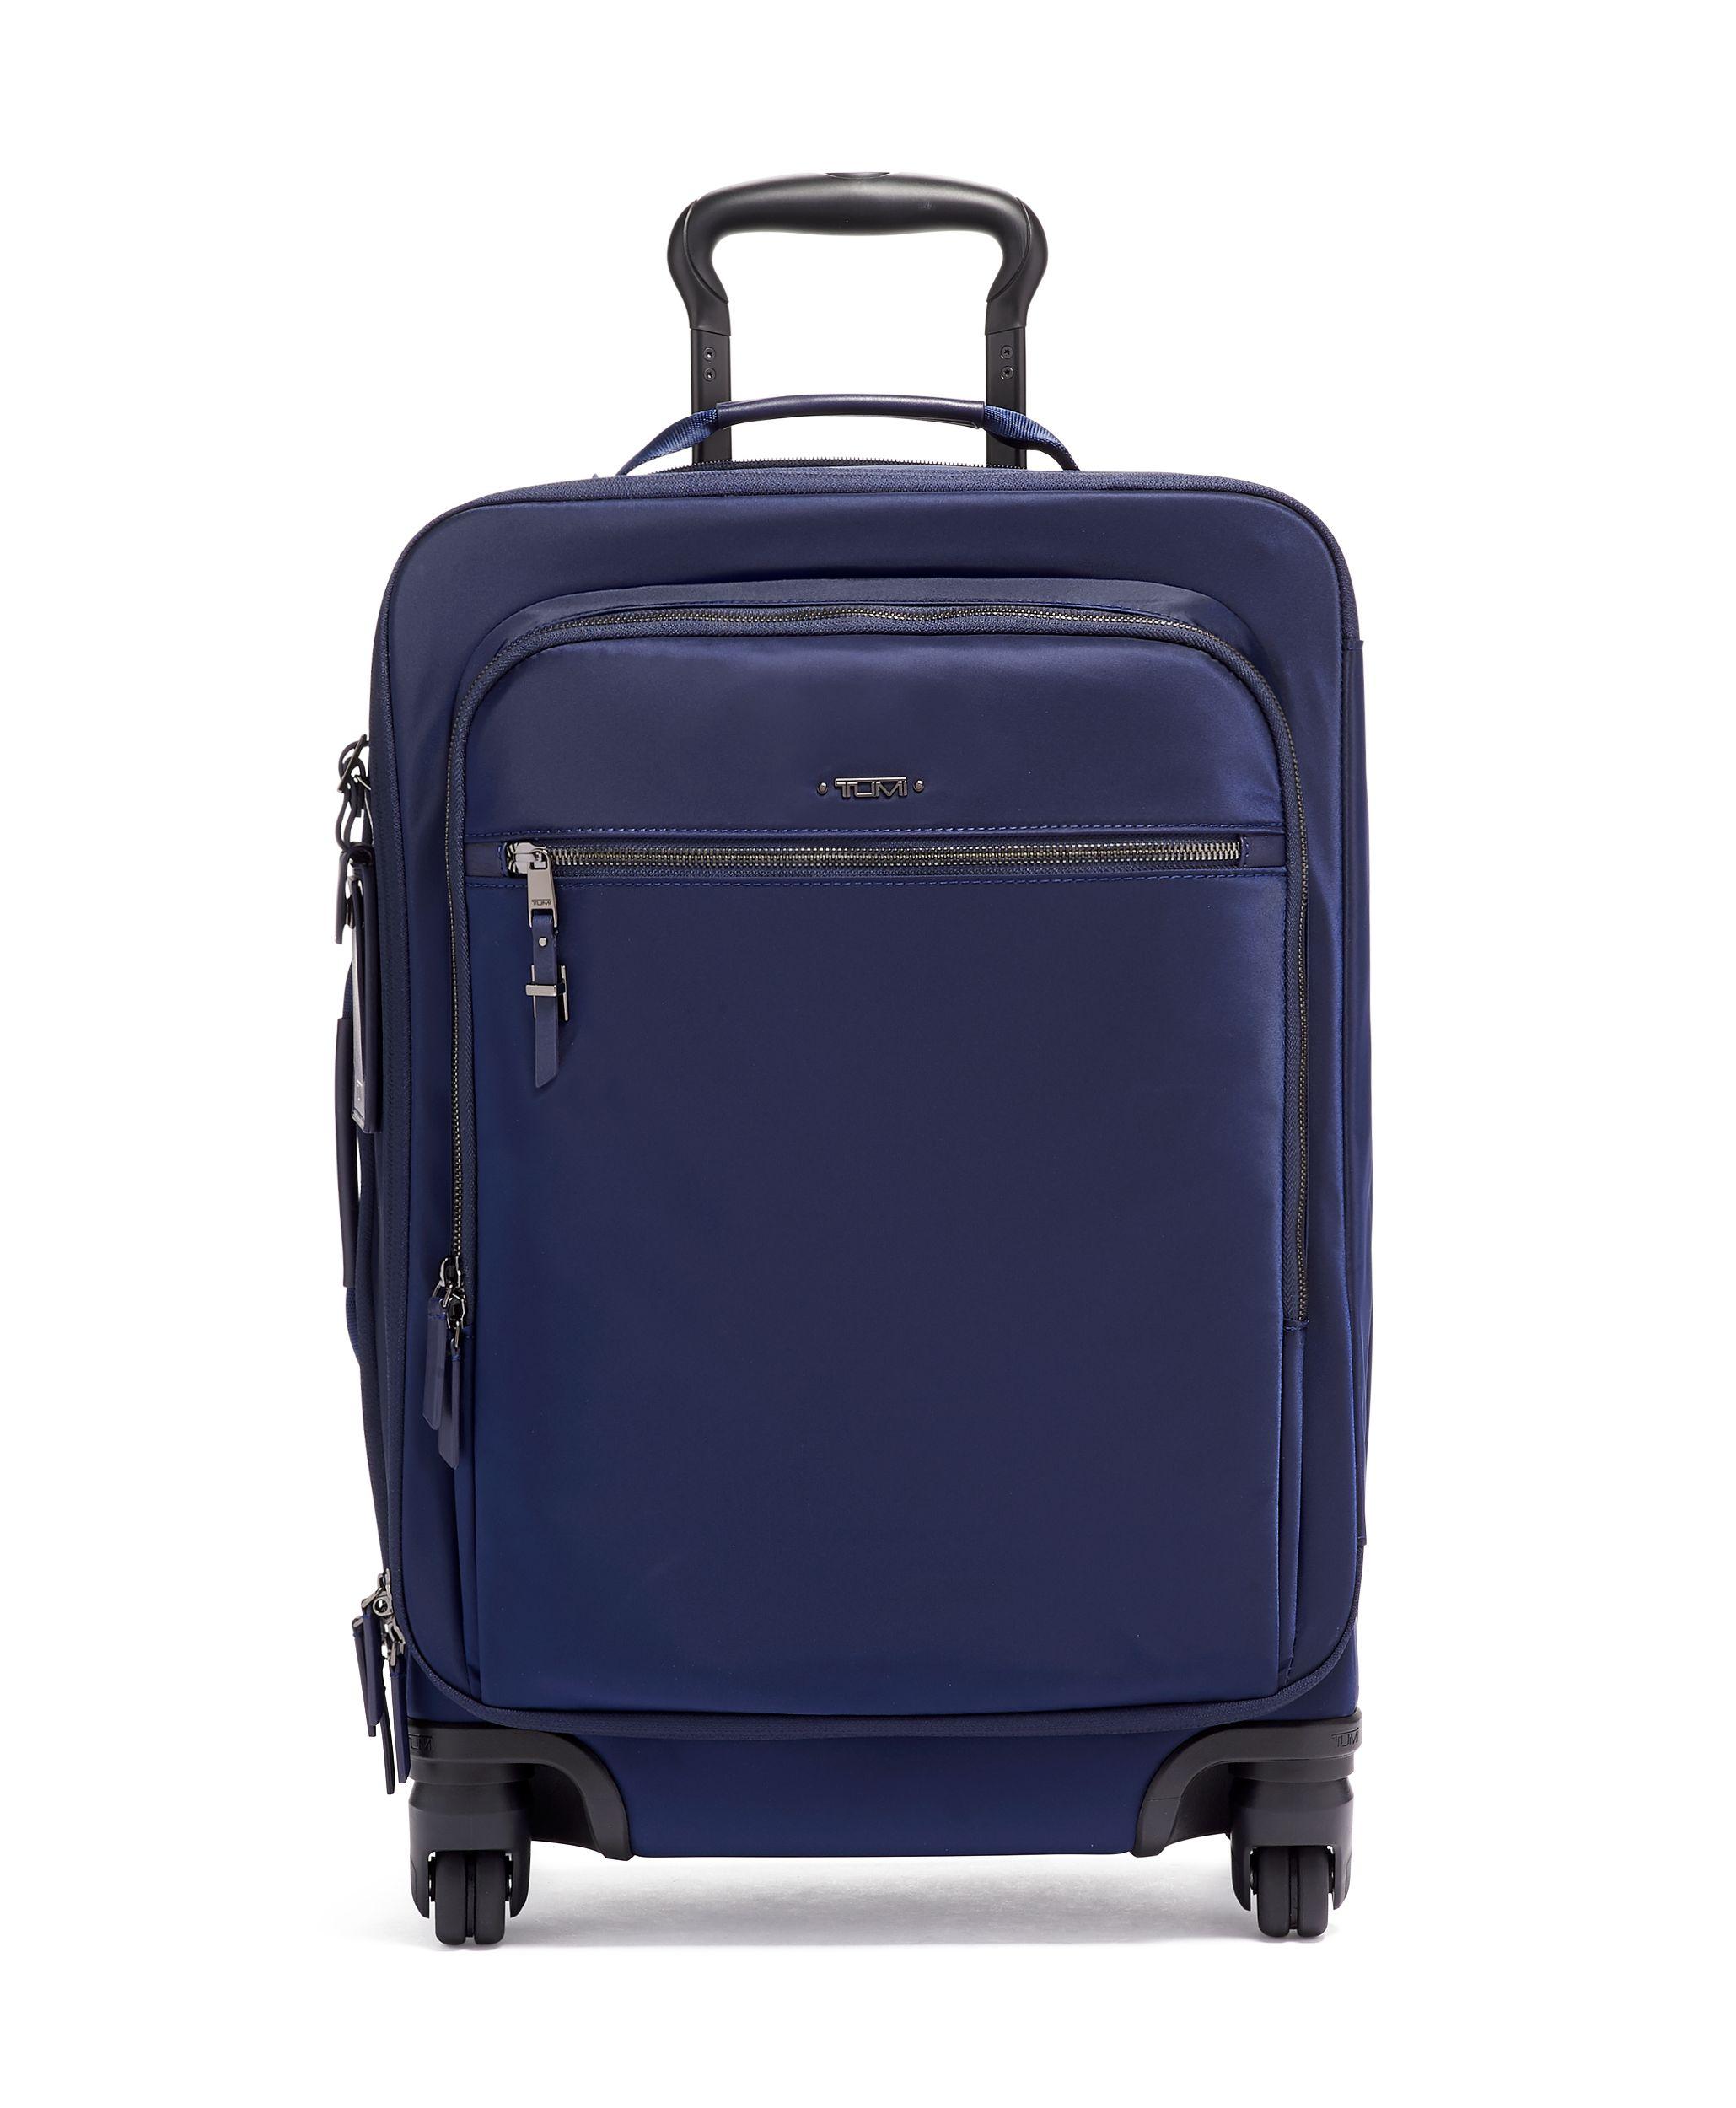 https://0201.nccdn.net/4_2/000/000/076/de9/luggage5-2059x2500.jpg